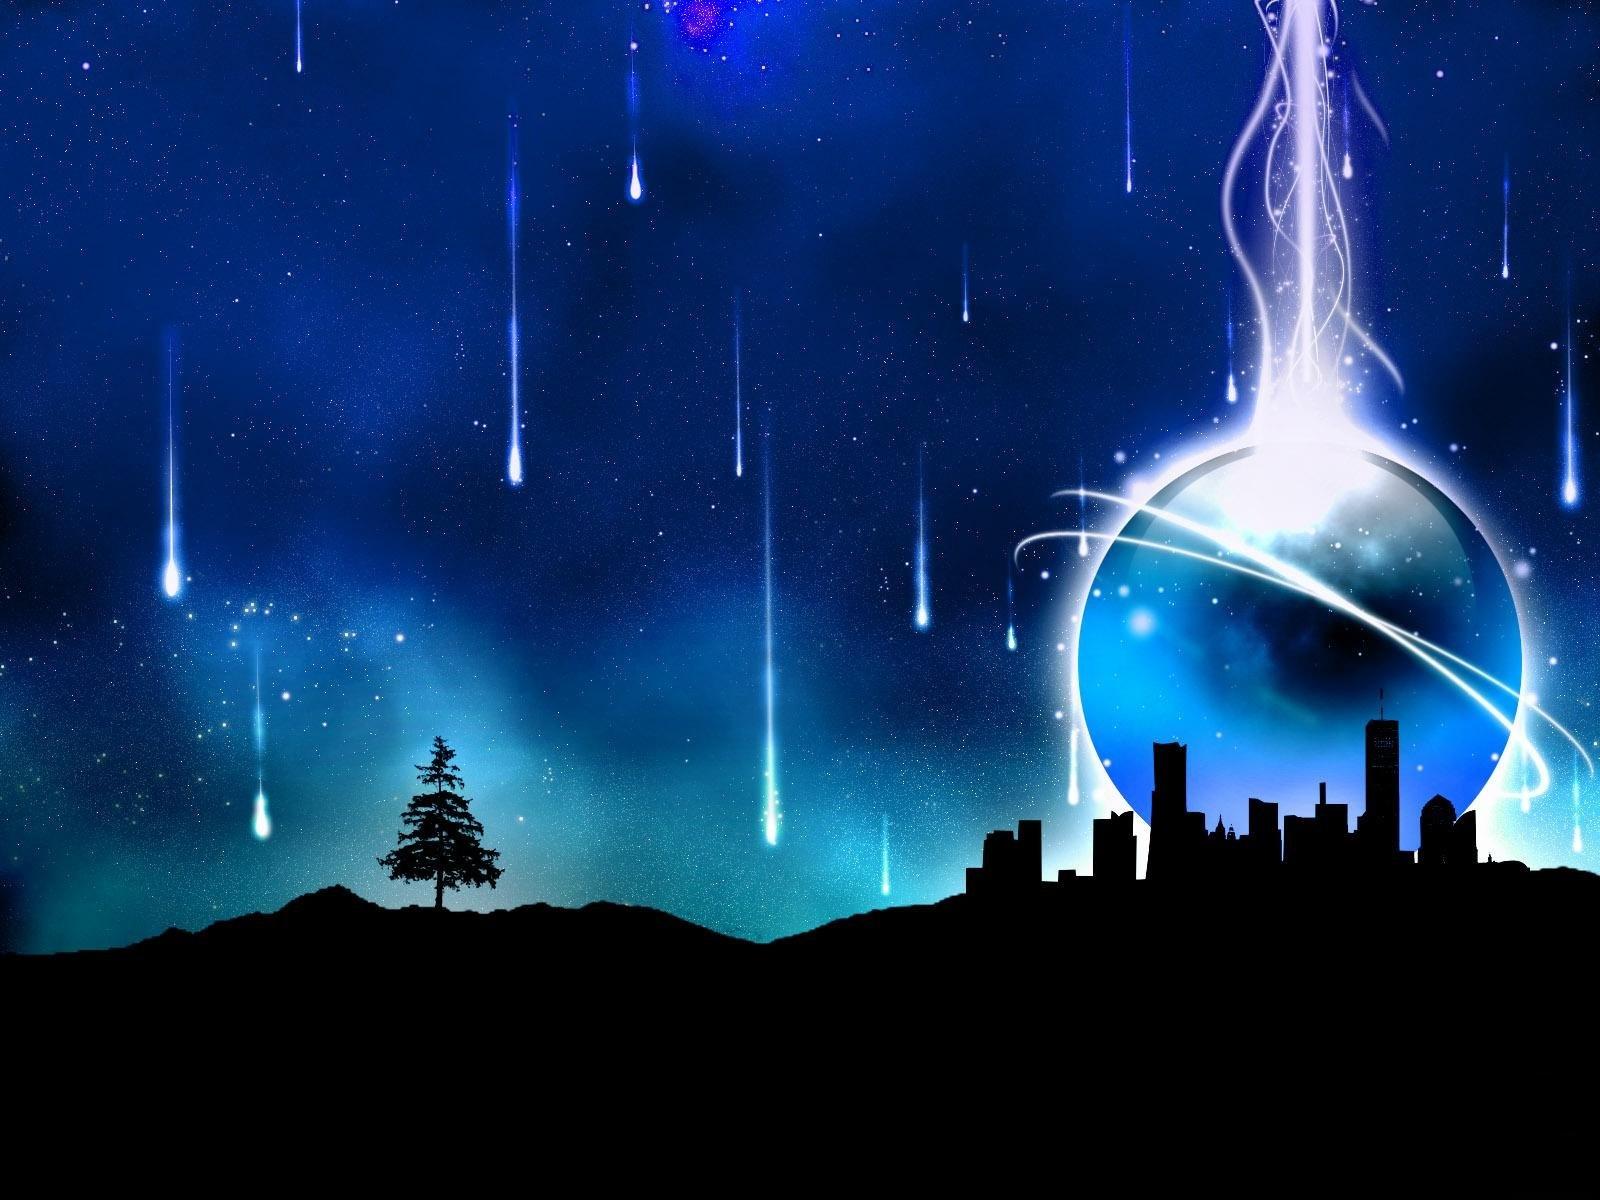 abstract wallpapers hd blue city - HD Desktop Wallpapers ...